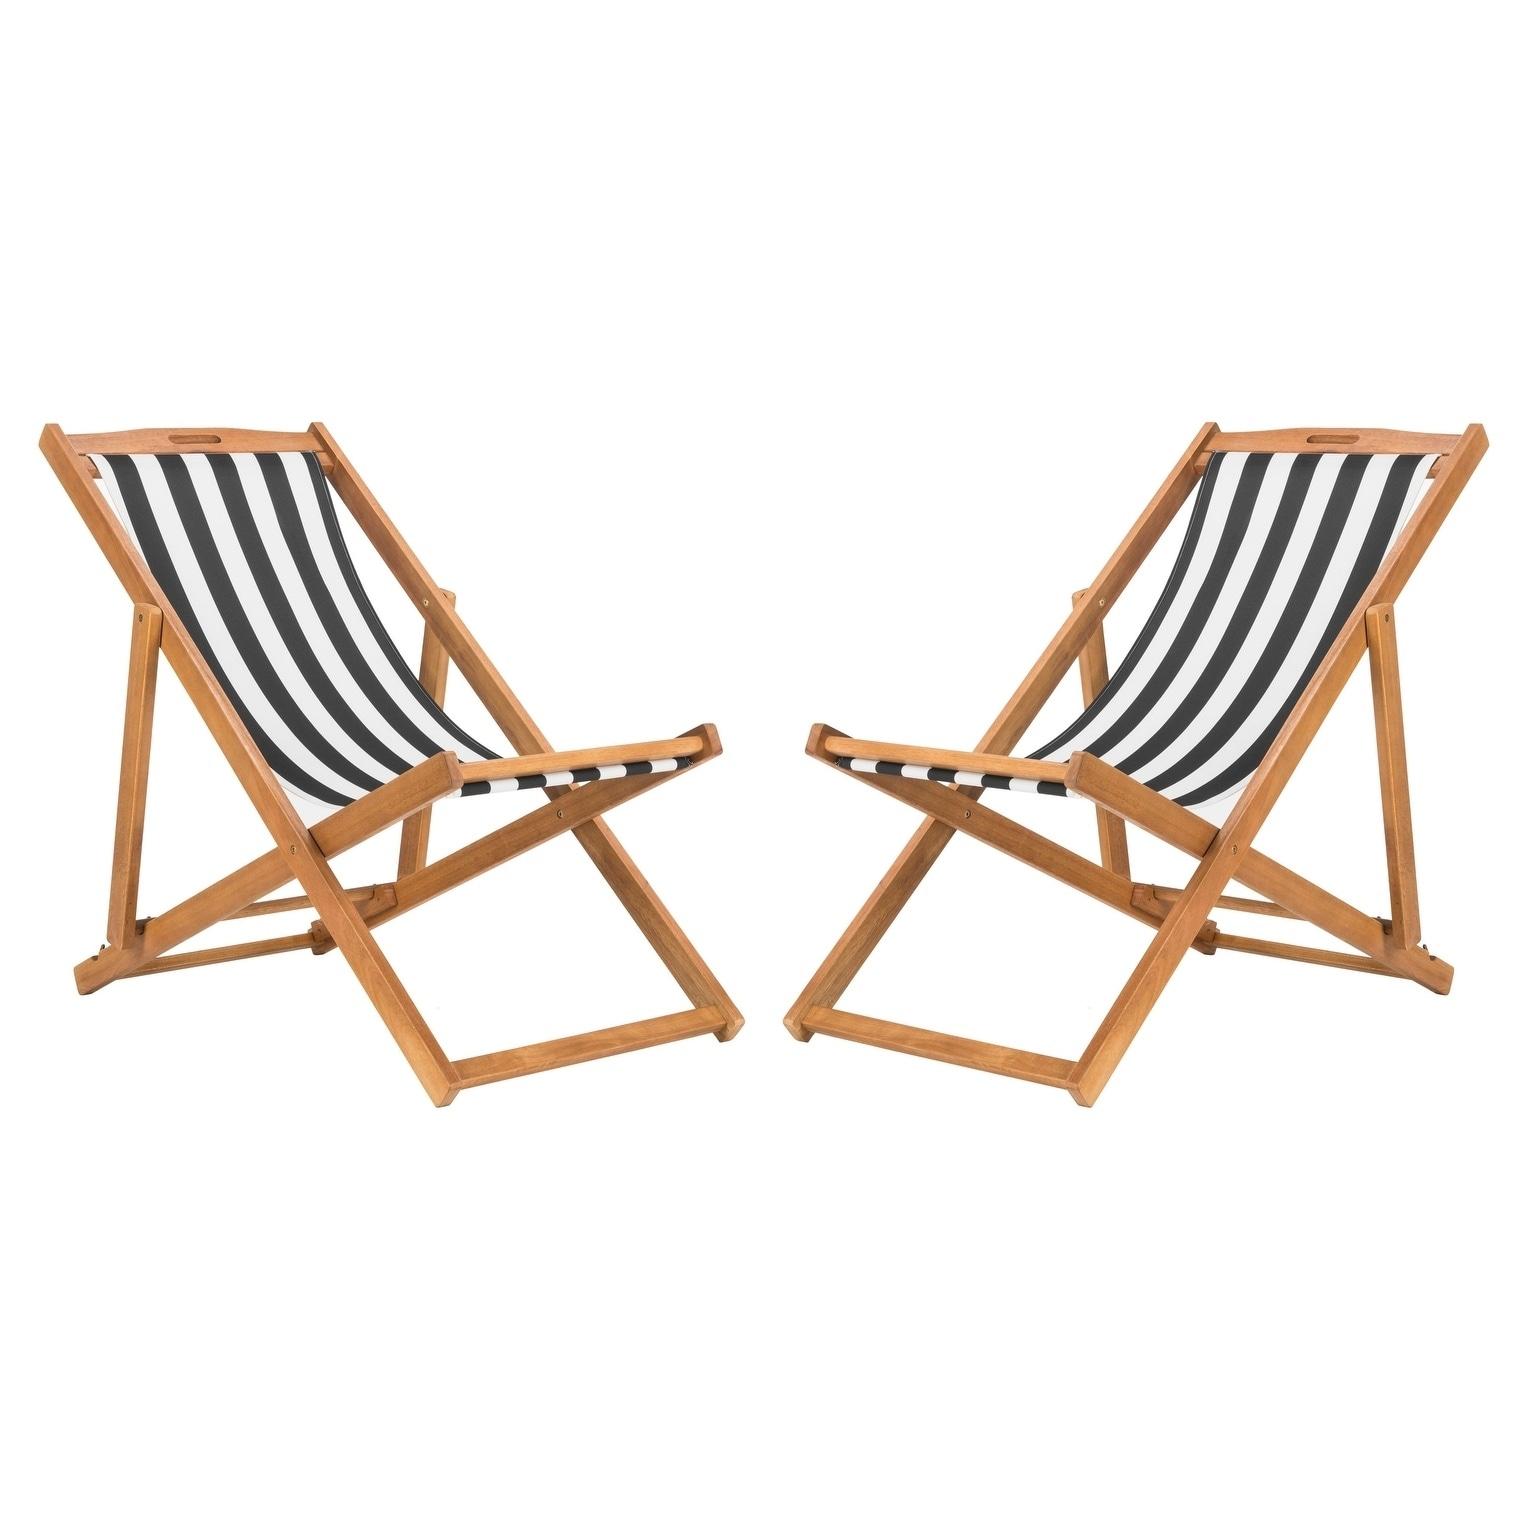 Shop Safavieh Outdoor Living Loren Foldable Sling Chair Black